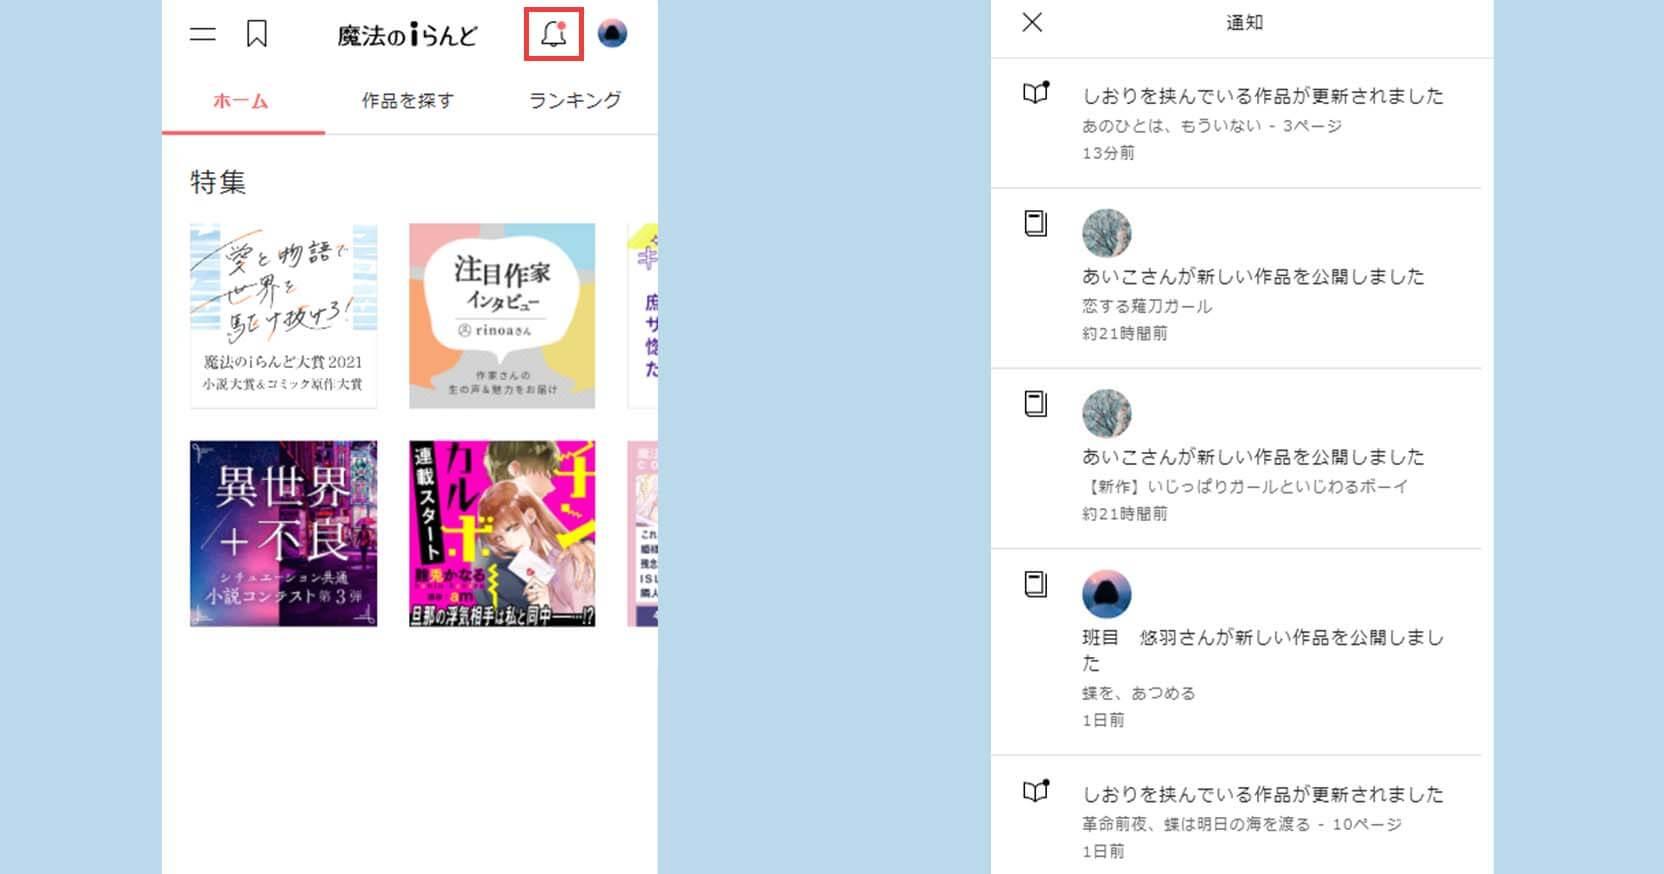 https://storage.googleapis.com/blog-info/entry/2021/09/dokusya_tuuchi_blog.jpg